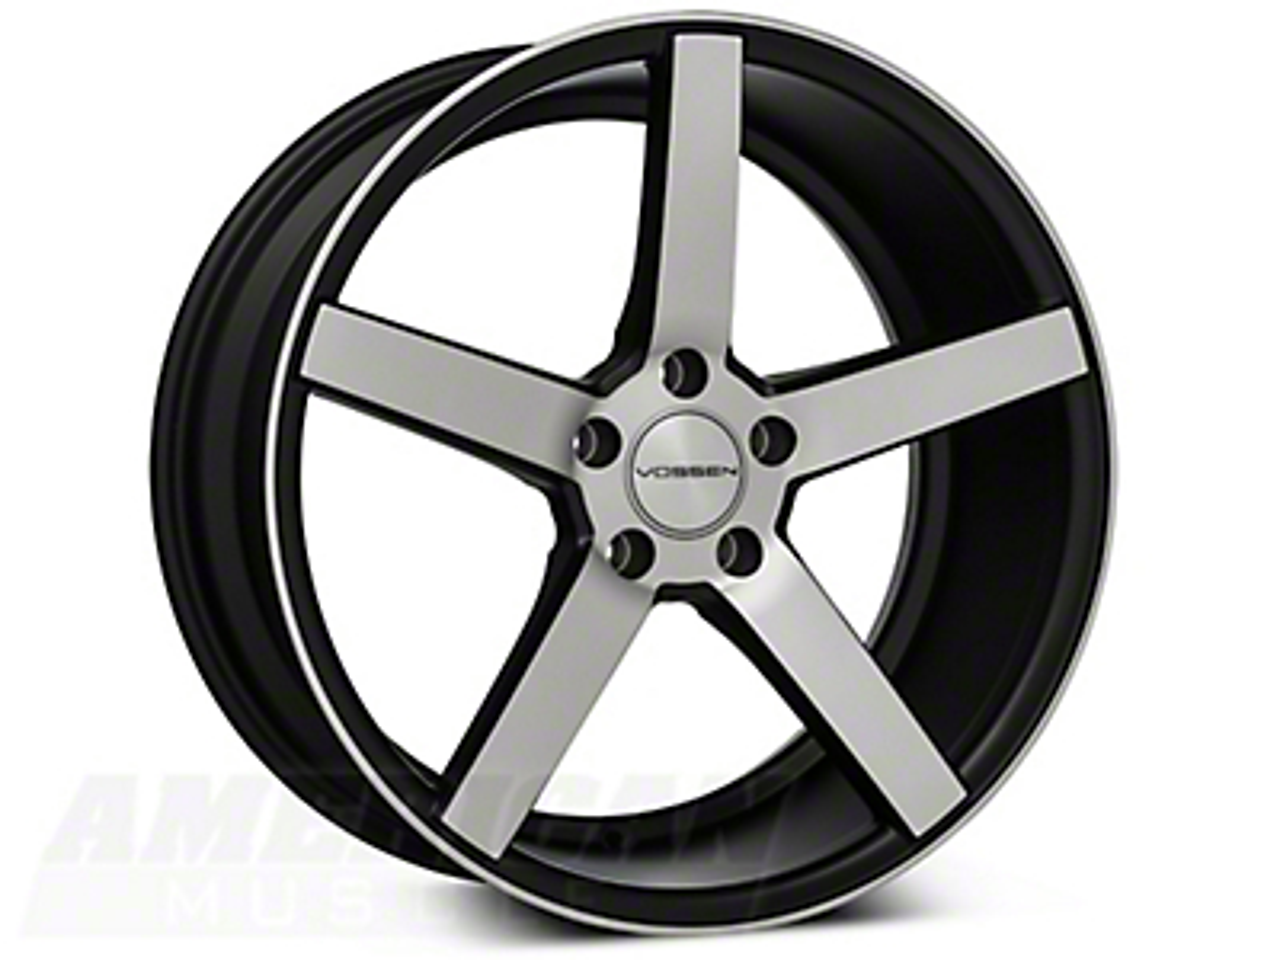 Vossen CV3 Machined Matte Black Wheel - 19x8.5 (05-14 All)